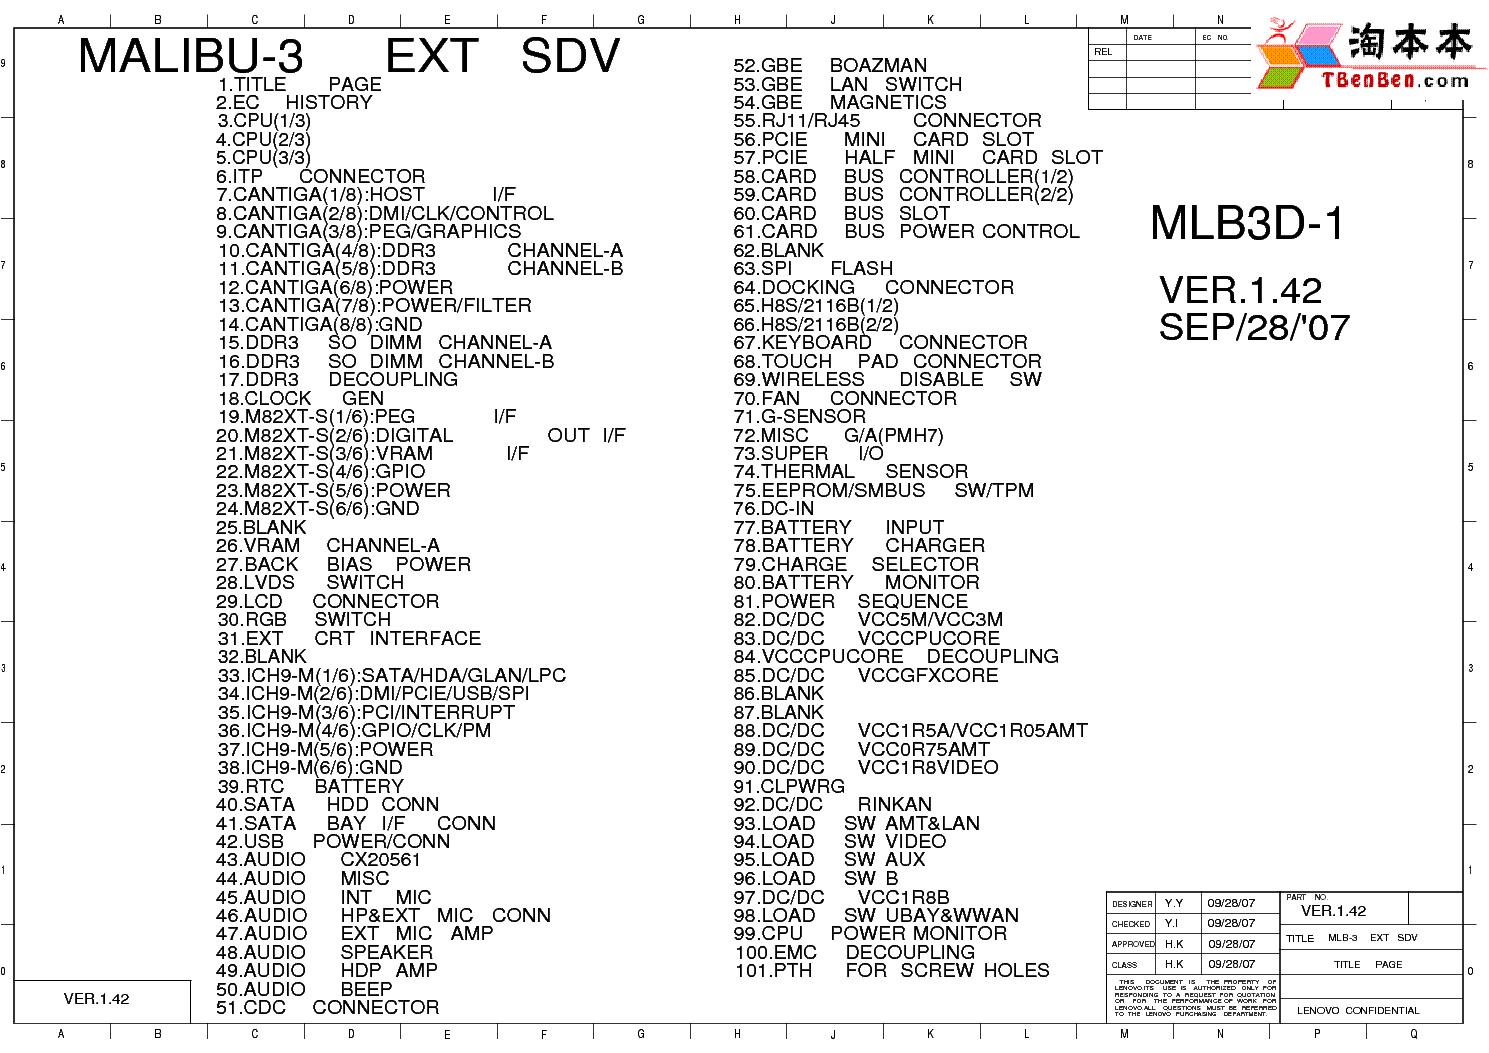 LENOVO THINKPAD T400 MALIBU-3 EXT MLB3D-1 REV1 42 SCH